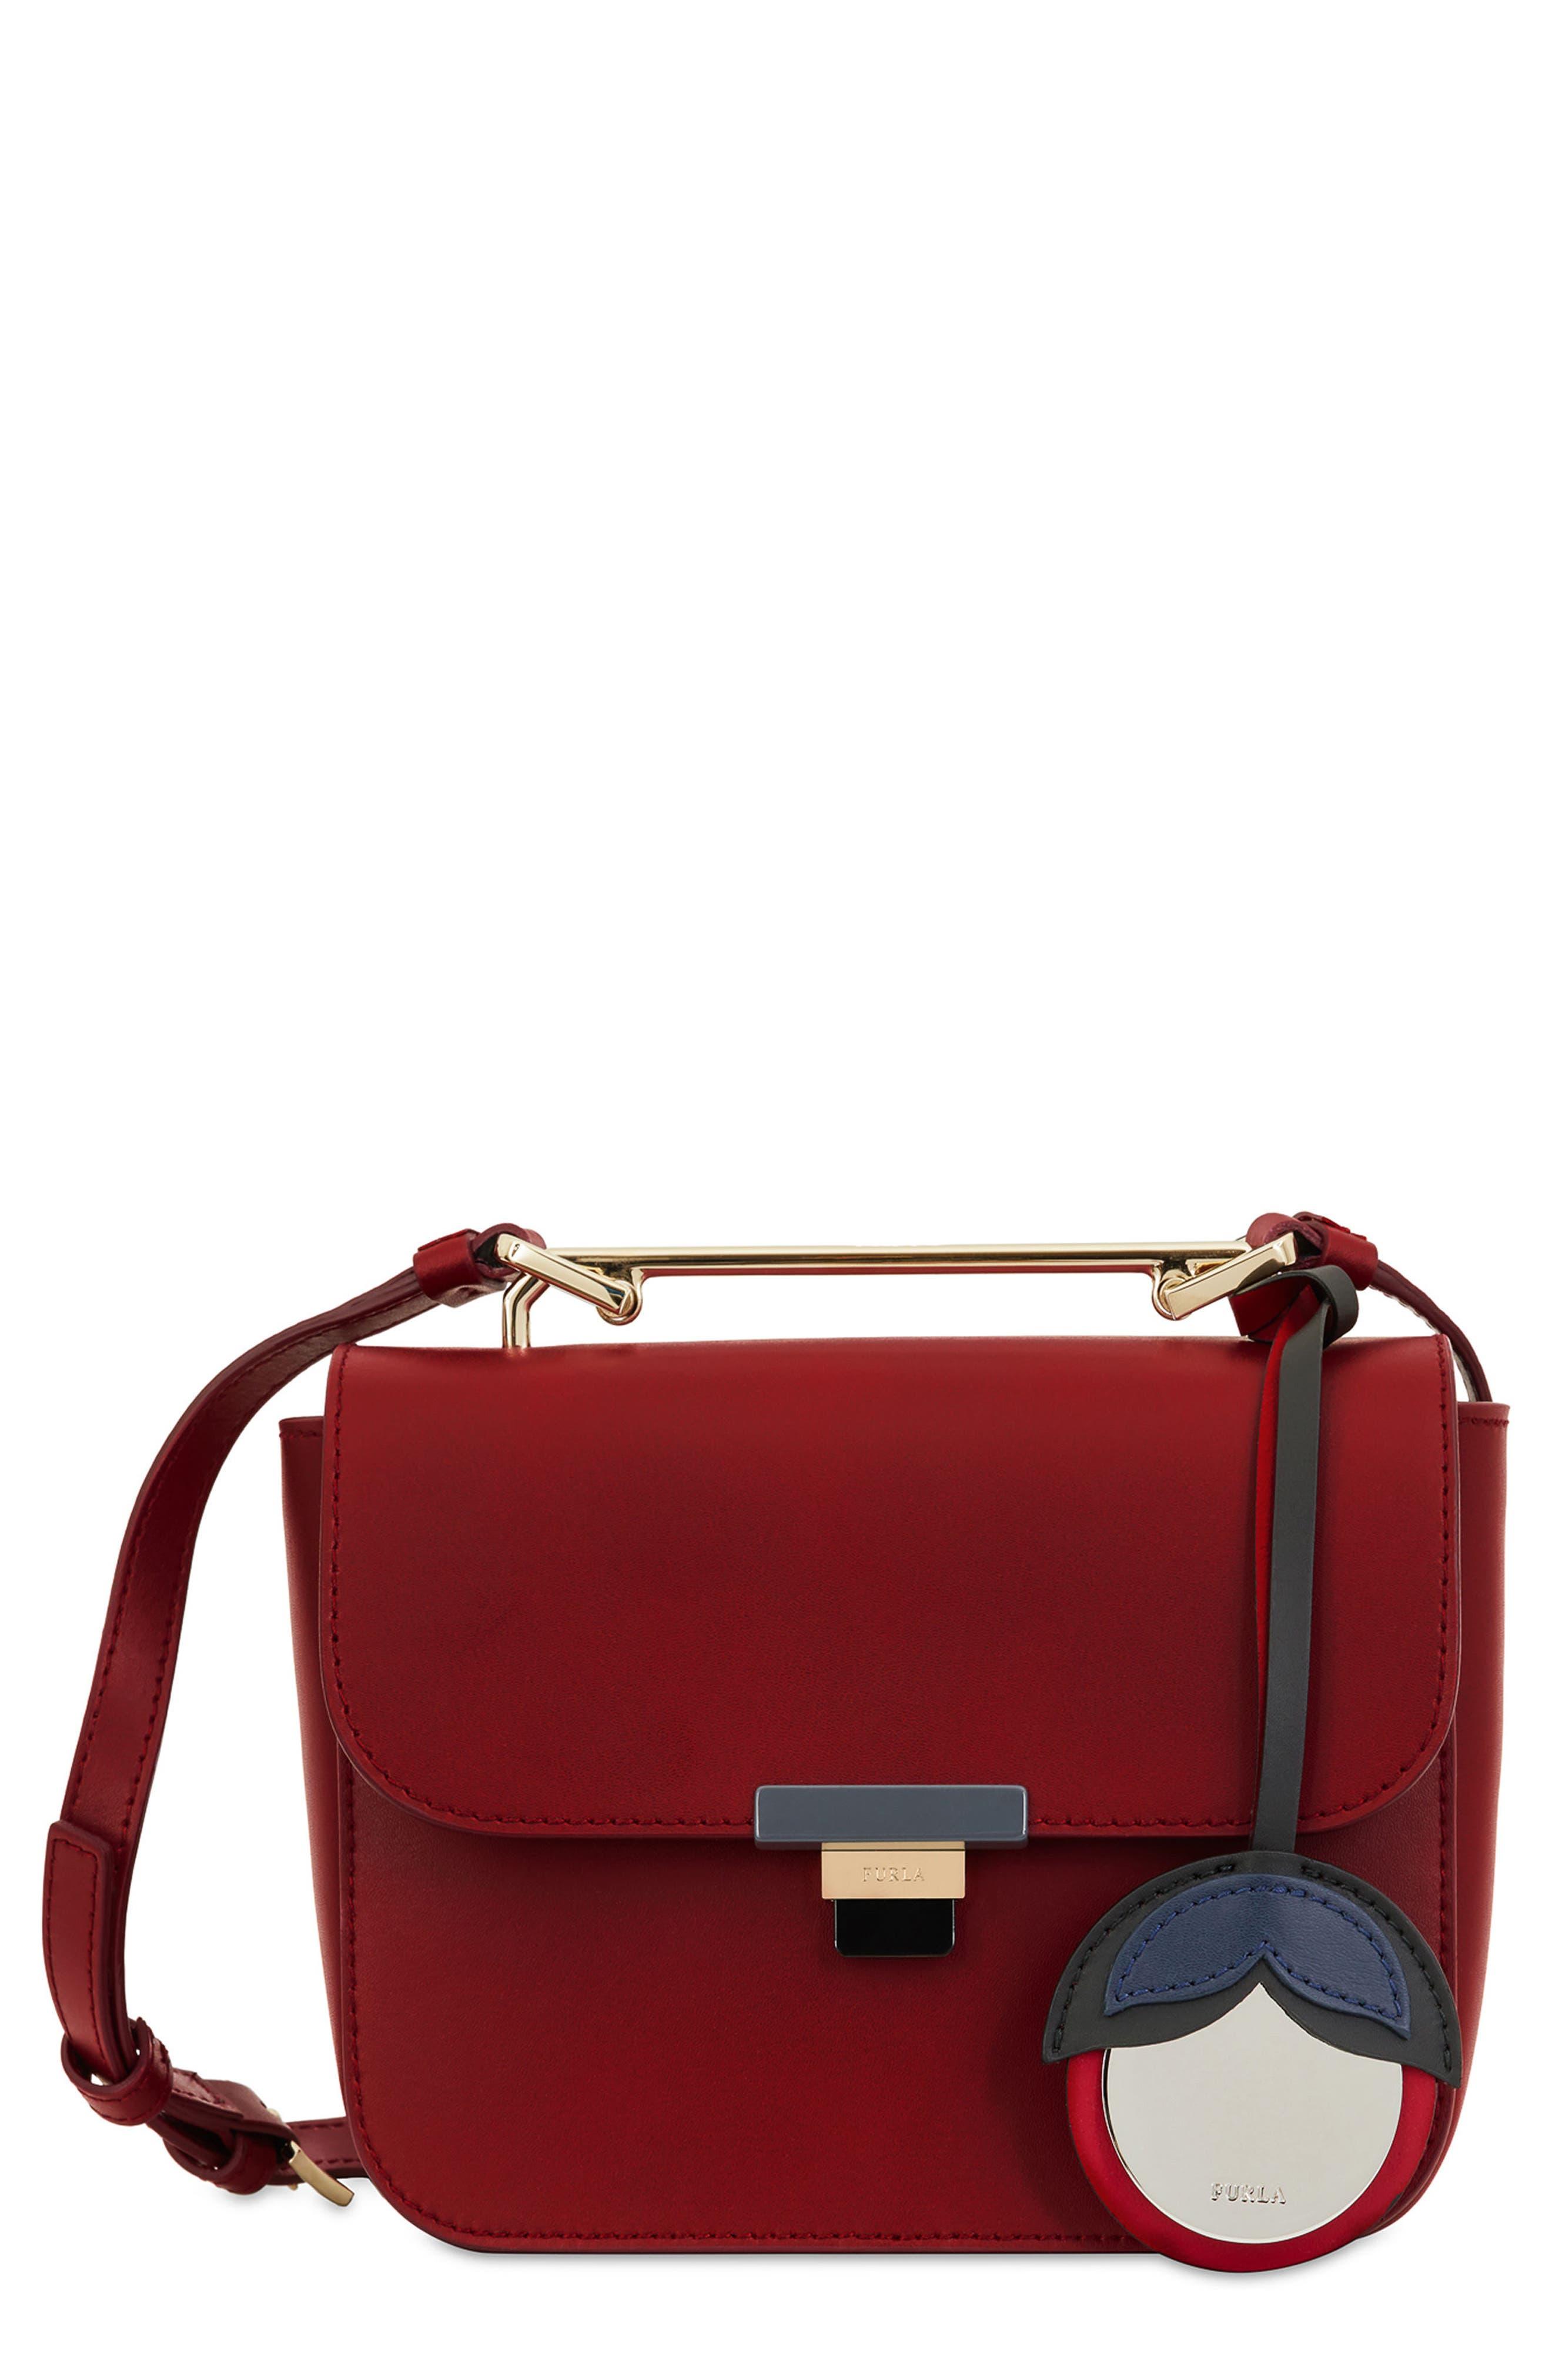 Elisir Mini Crossbody Bag,                         Main,                         color, Ciliegia